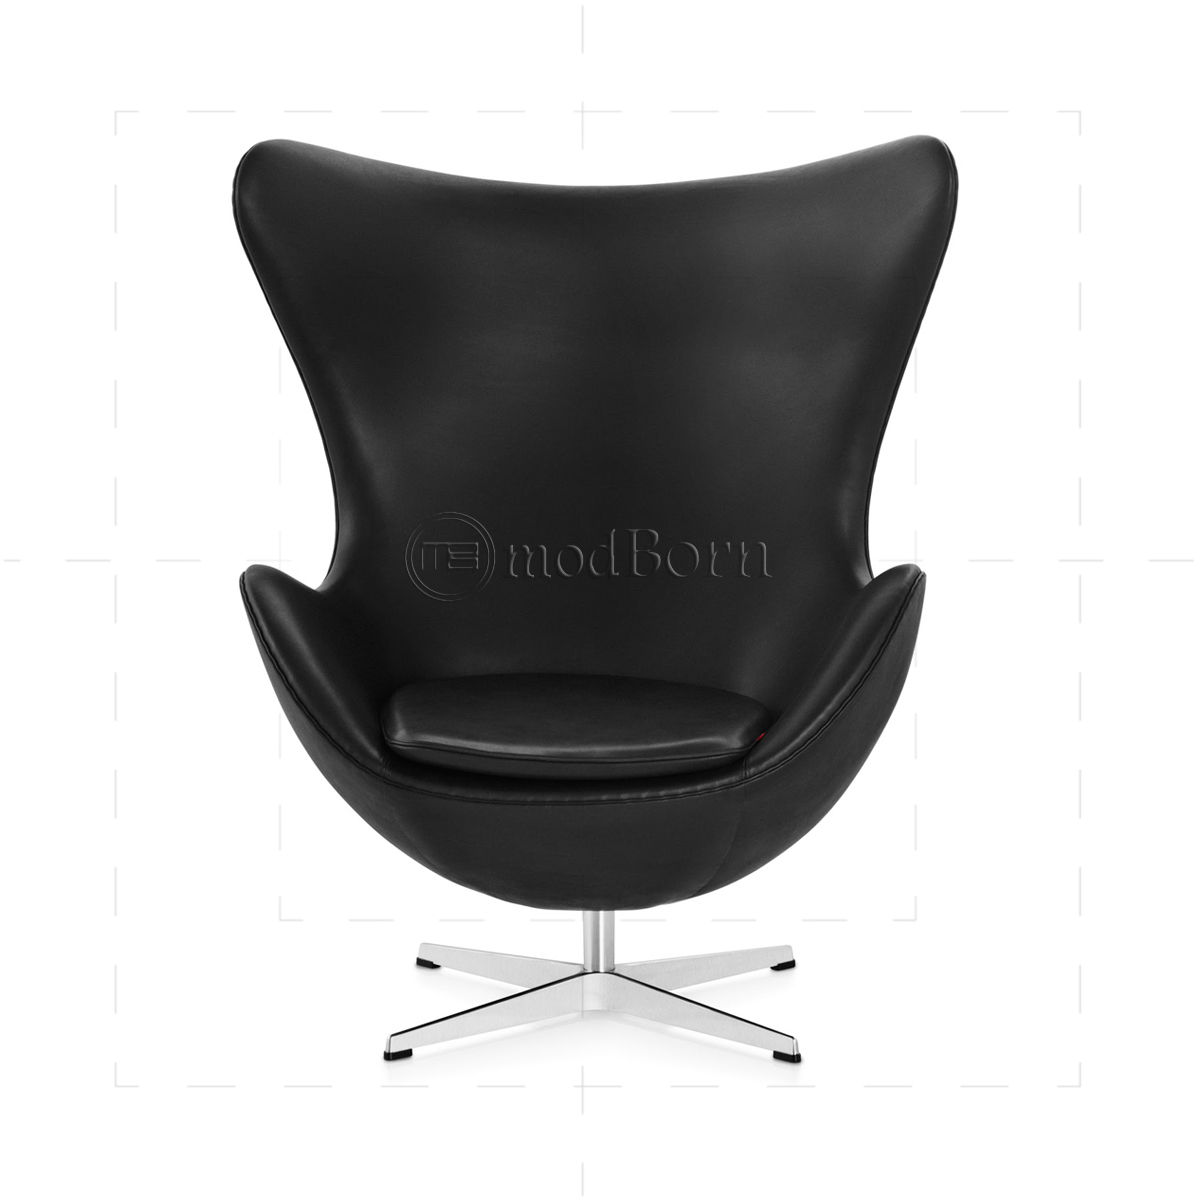 arne jacobsen style egg chair black leather arne jacobsen egg chair leather black